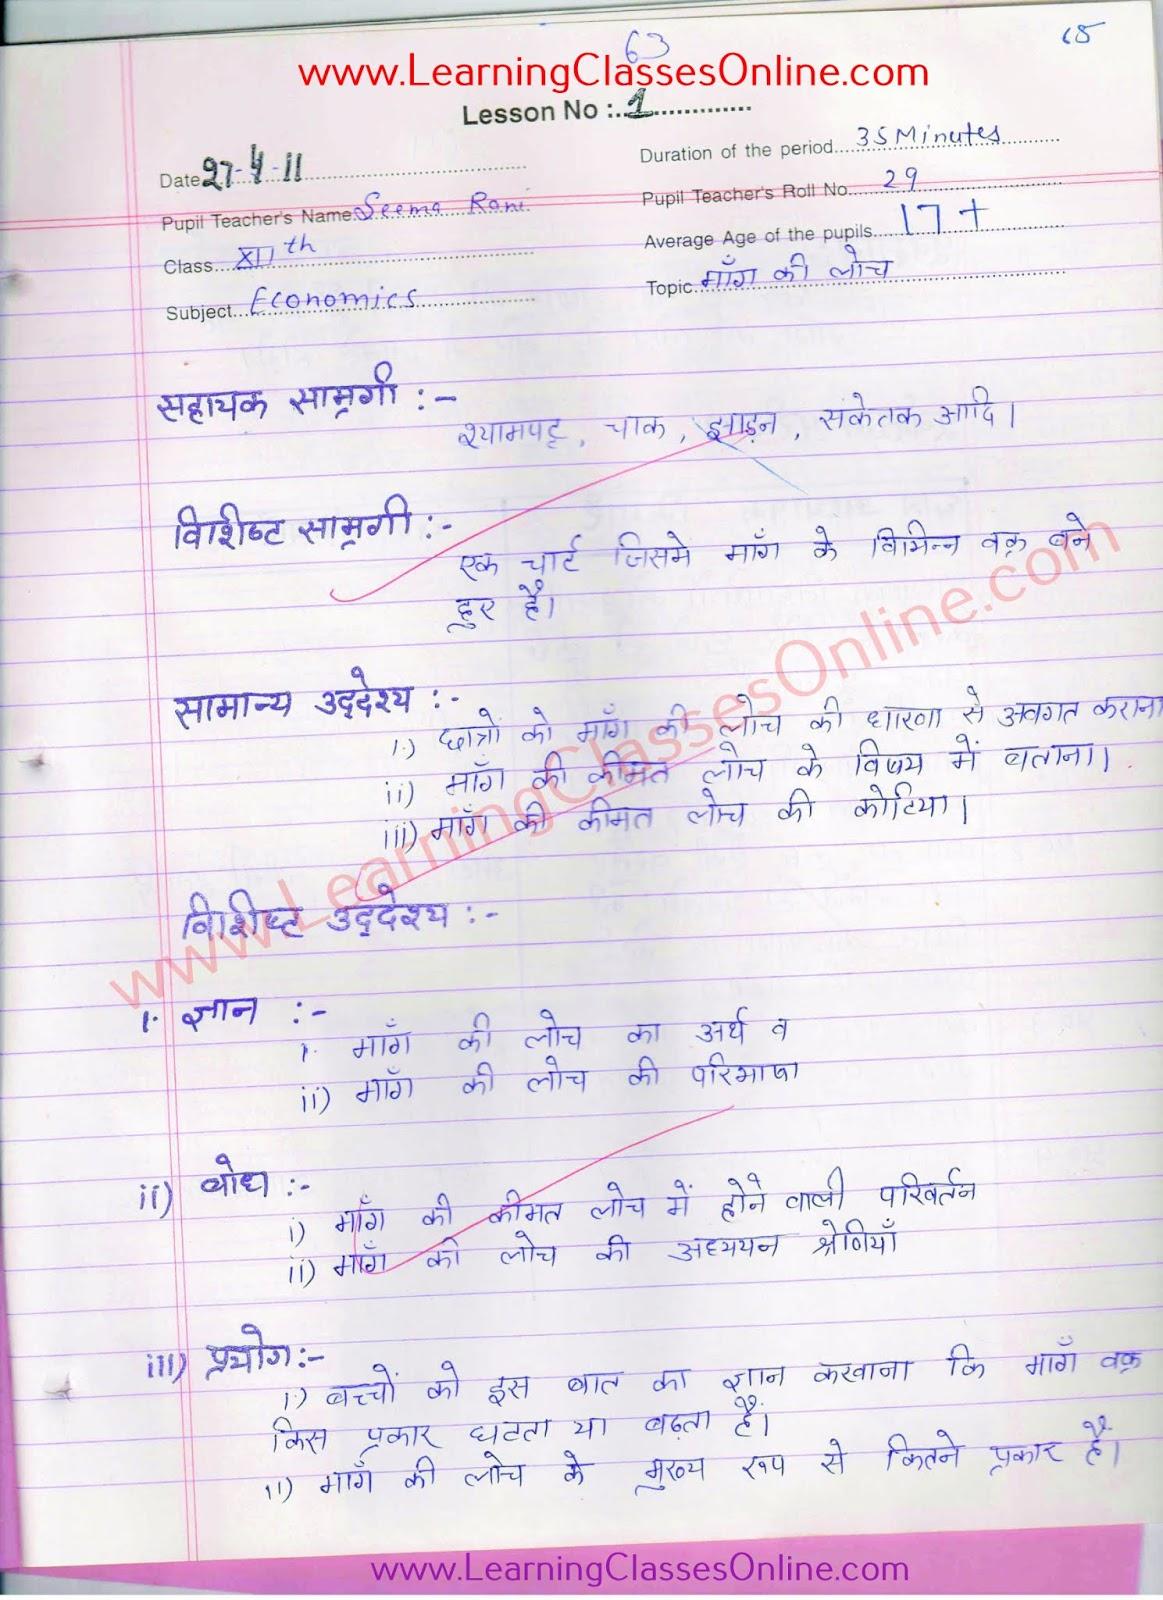 Elasticity of Demand Economics Lesson Plan in Hindi ( मांग की लोच पाठ योजना ) for Class 11th free download pdf